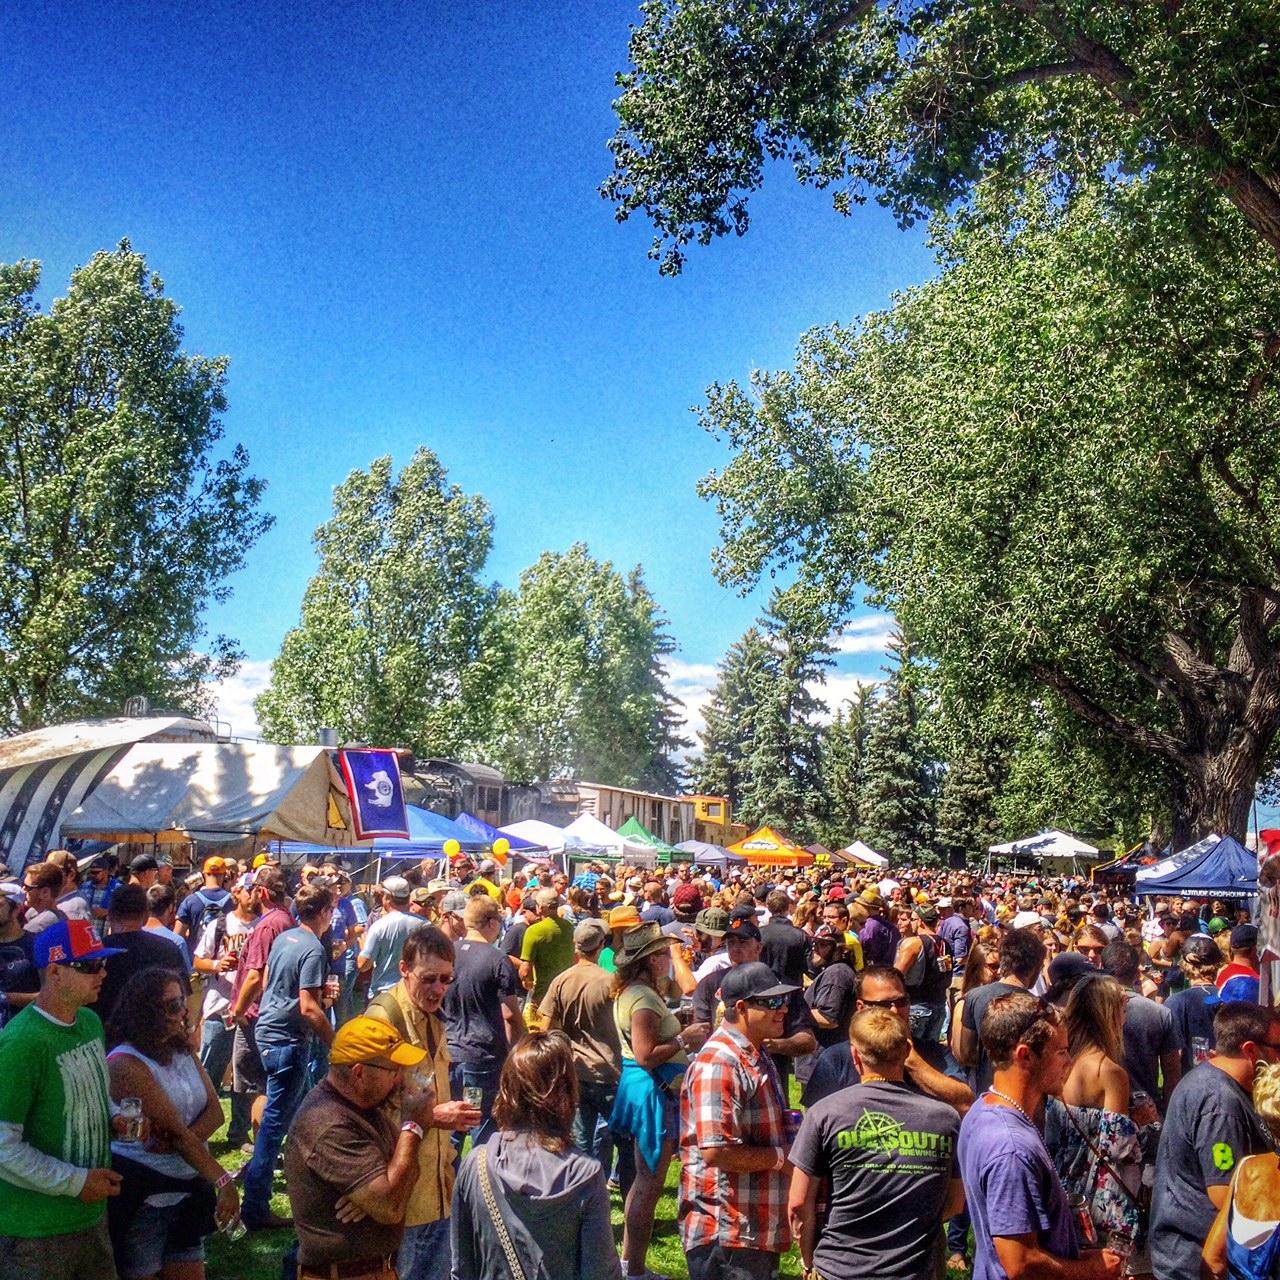 Laramie brewfest - July 13